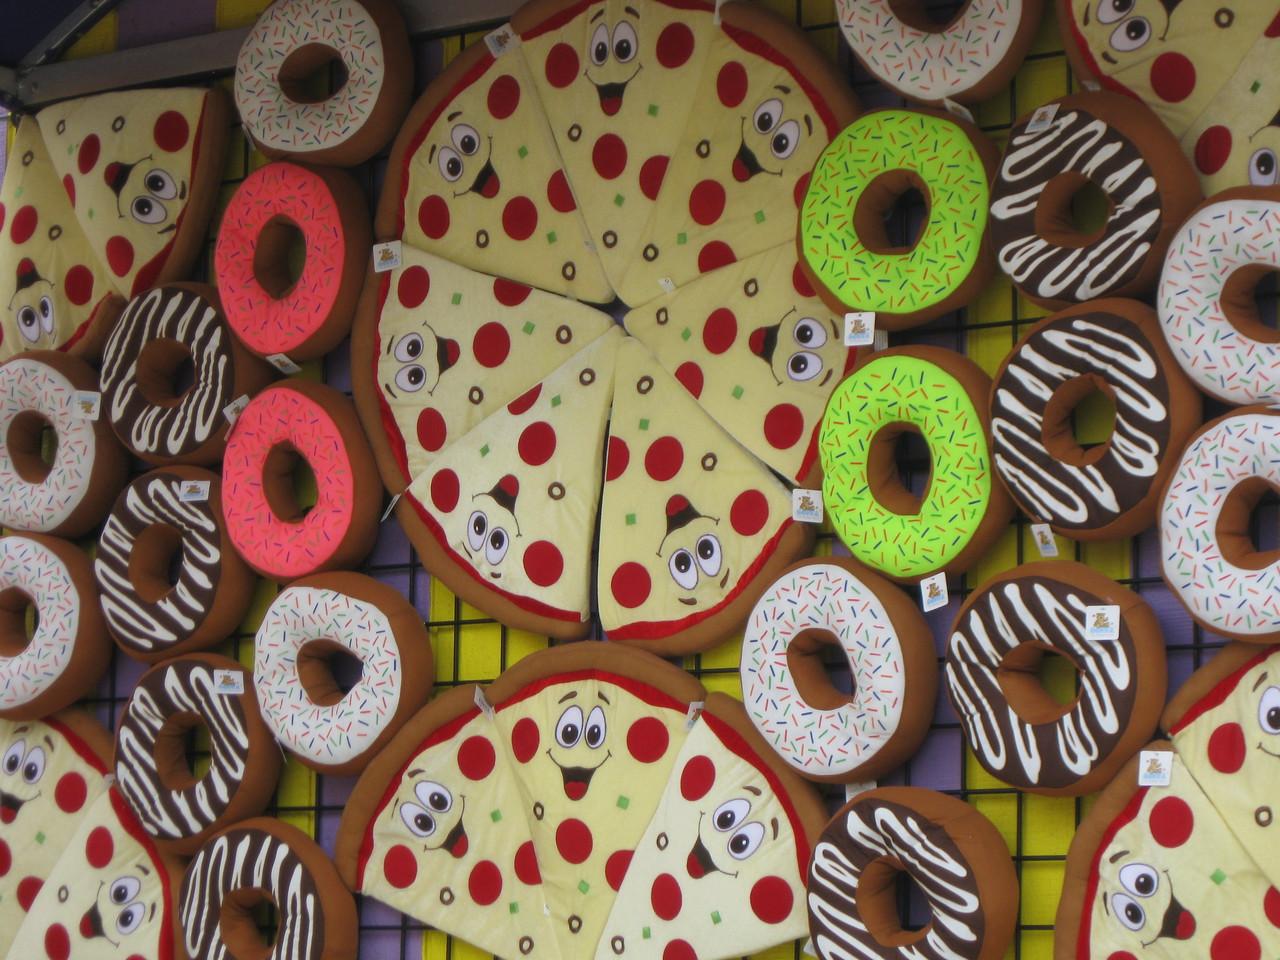 Doughnut and pizza plush prizes.